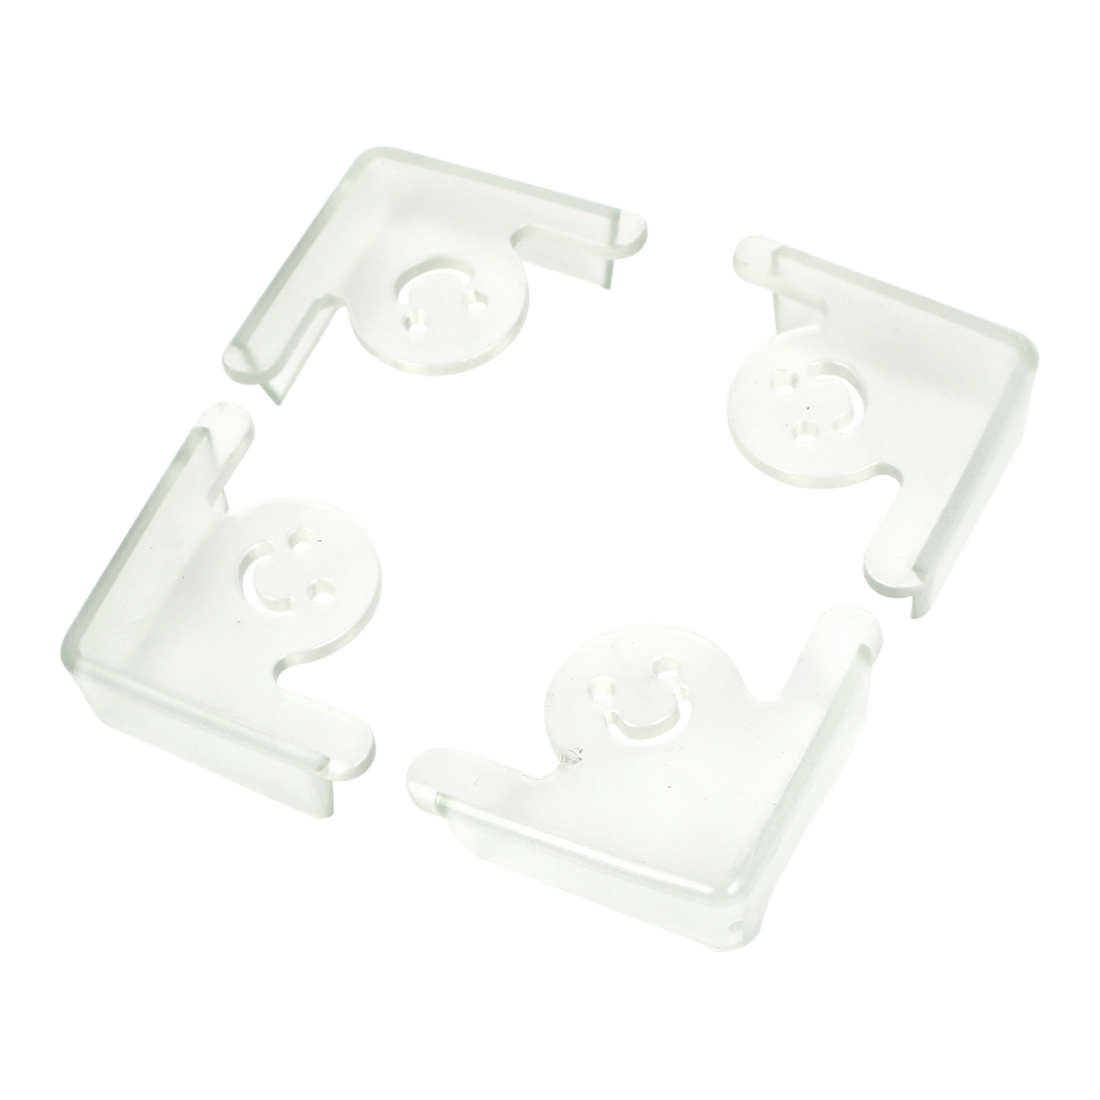 Smiling Face Pattern Table Desk Corner Edge Cushion Guard Protector Clear 4Pcs